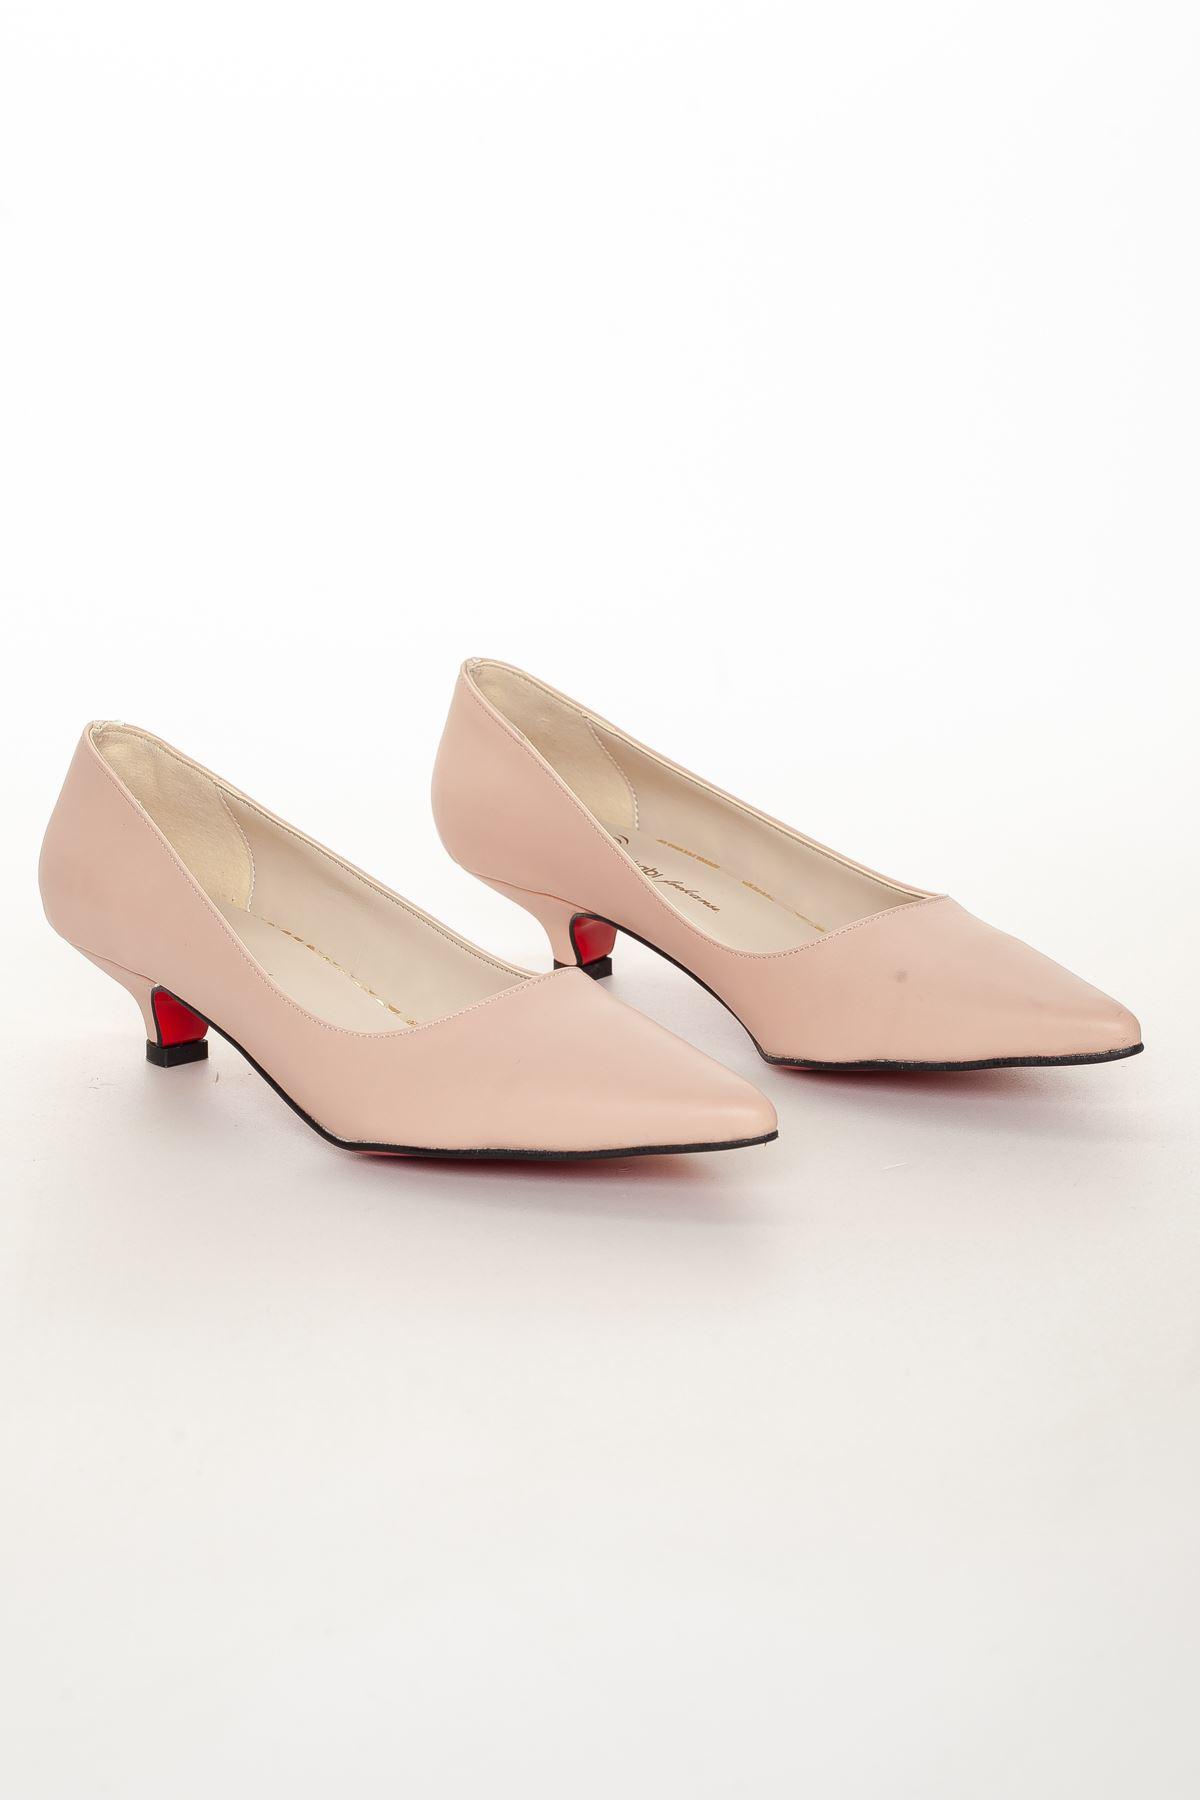 Odella Topuklu Ayakkabı PUDRA